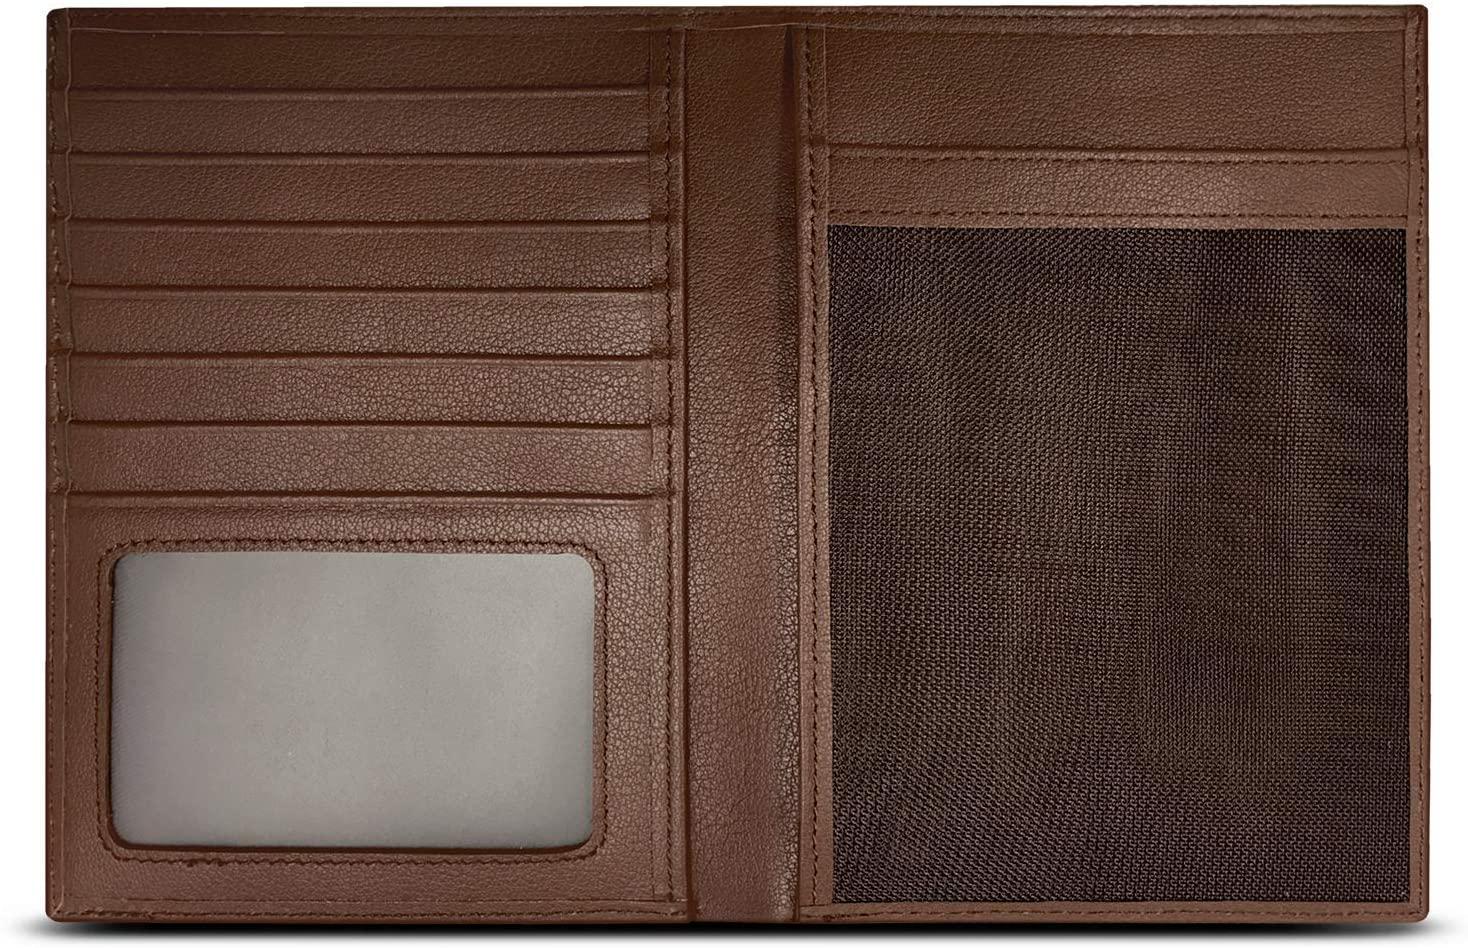 RFID Blocking Leather Passport Holder For Men and Women - Brown